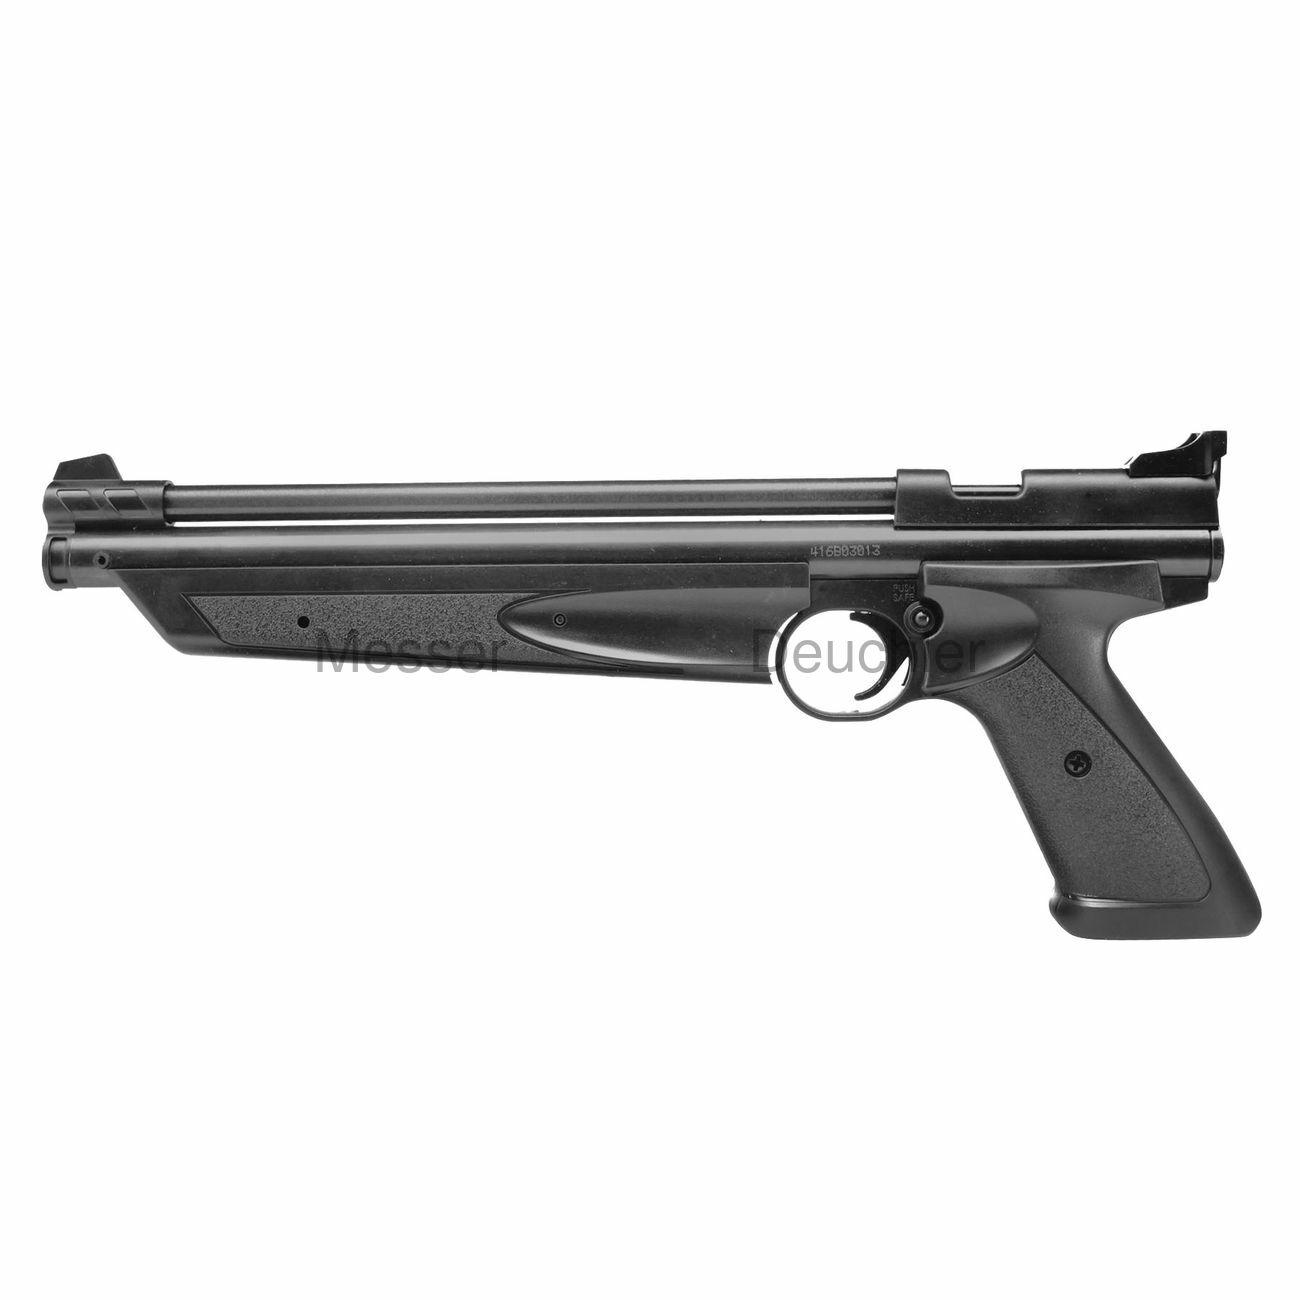 Crosman Mod.1377 Pneumatik Luftpistole schwarz